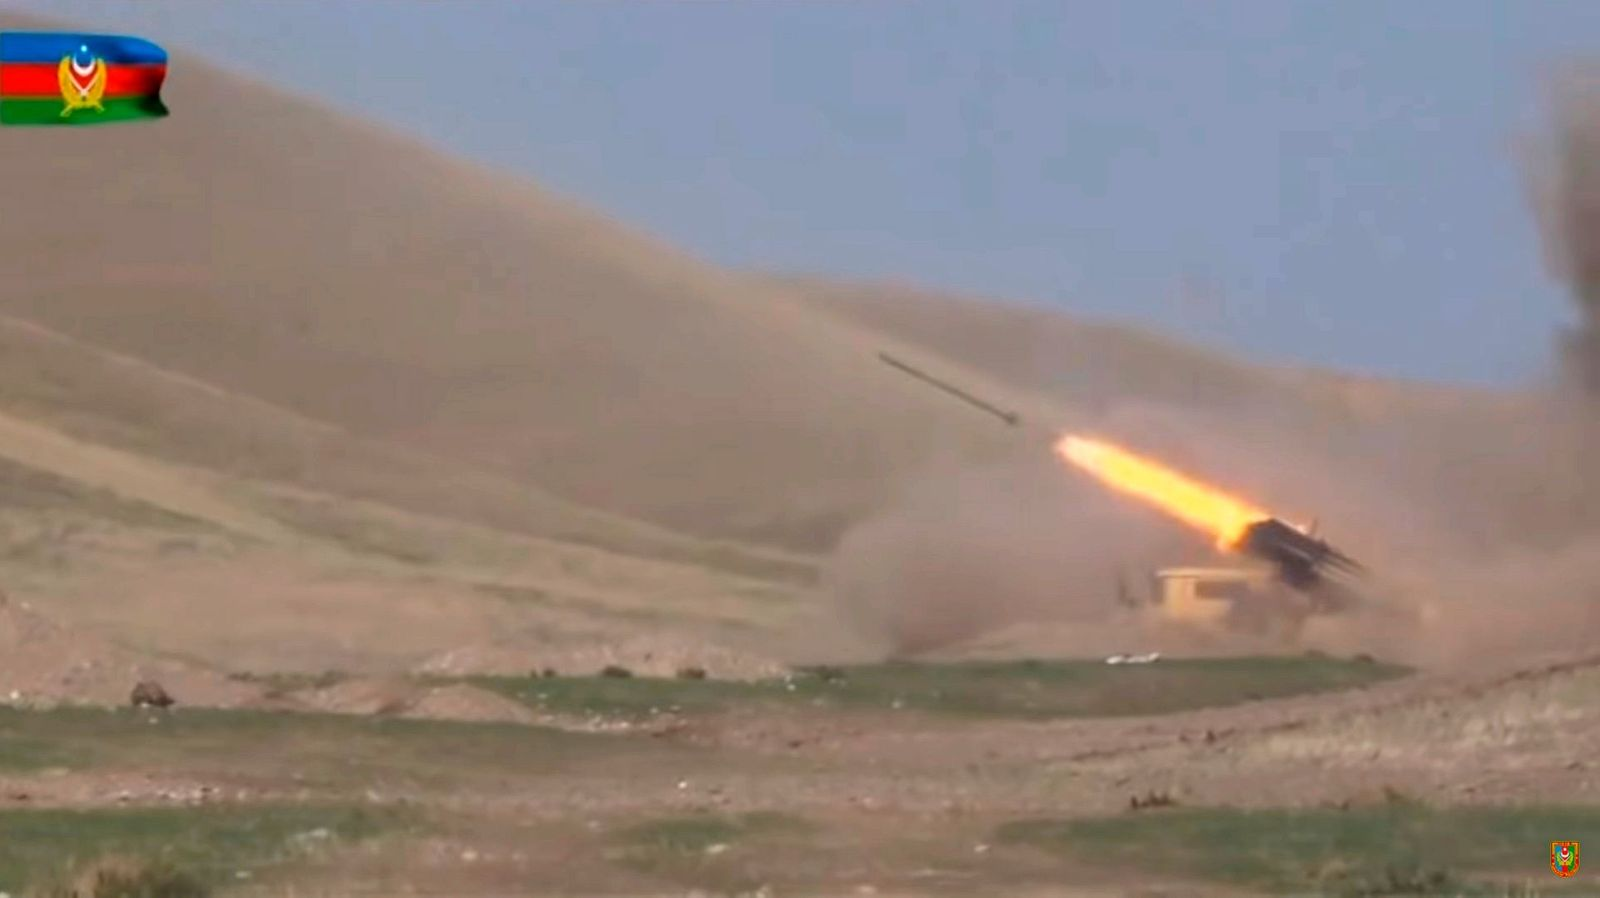 Azerbaijan and Armenia in armed conflict over Nagorno-Karabakh region, Martuni - 28 Sep 2020